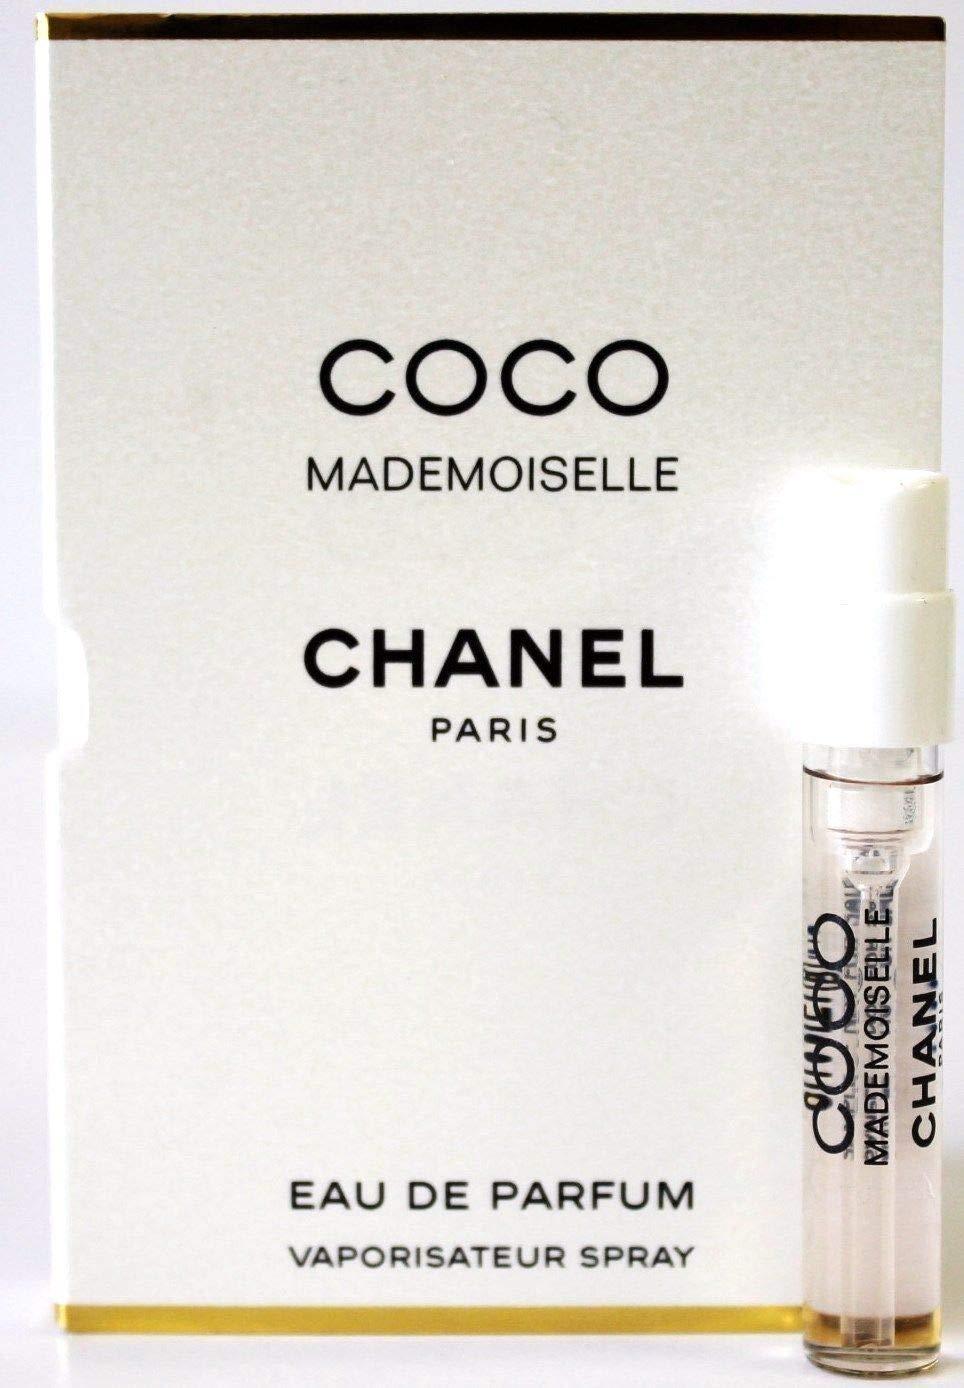 Coco Mademoiselle Eau De Parfum Perfume Sample Vial Travel 1.5 Ml/0.05 Oz by Paris Fragrance